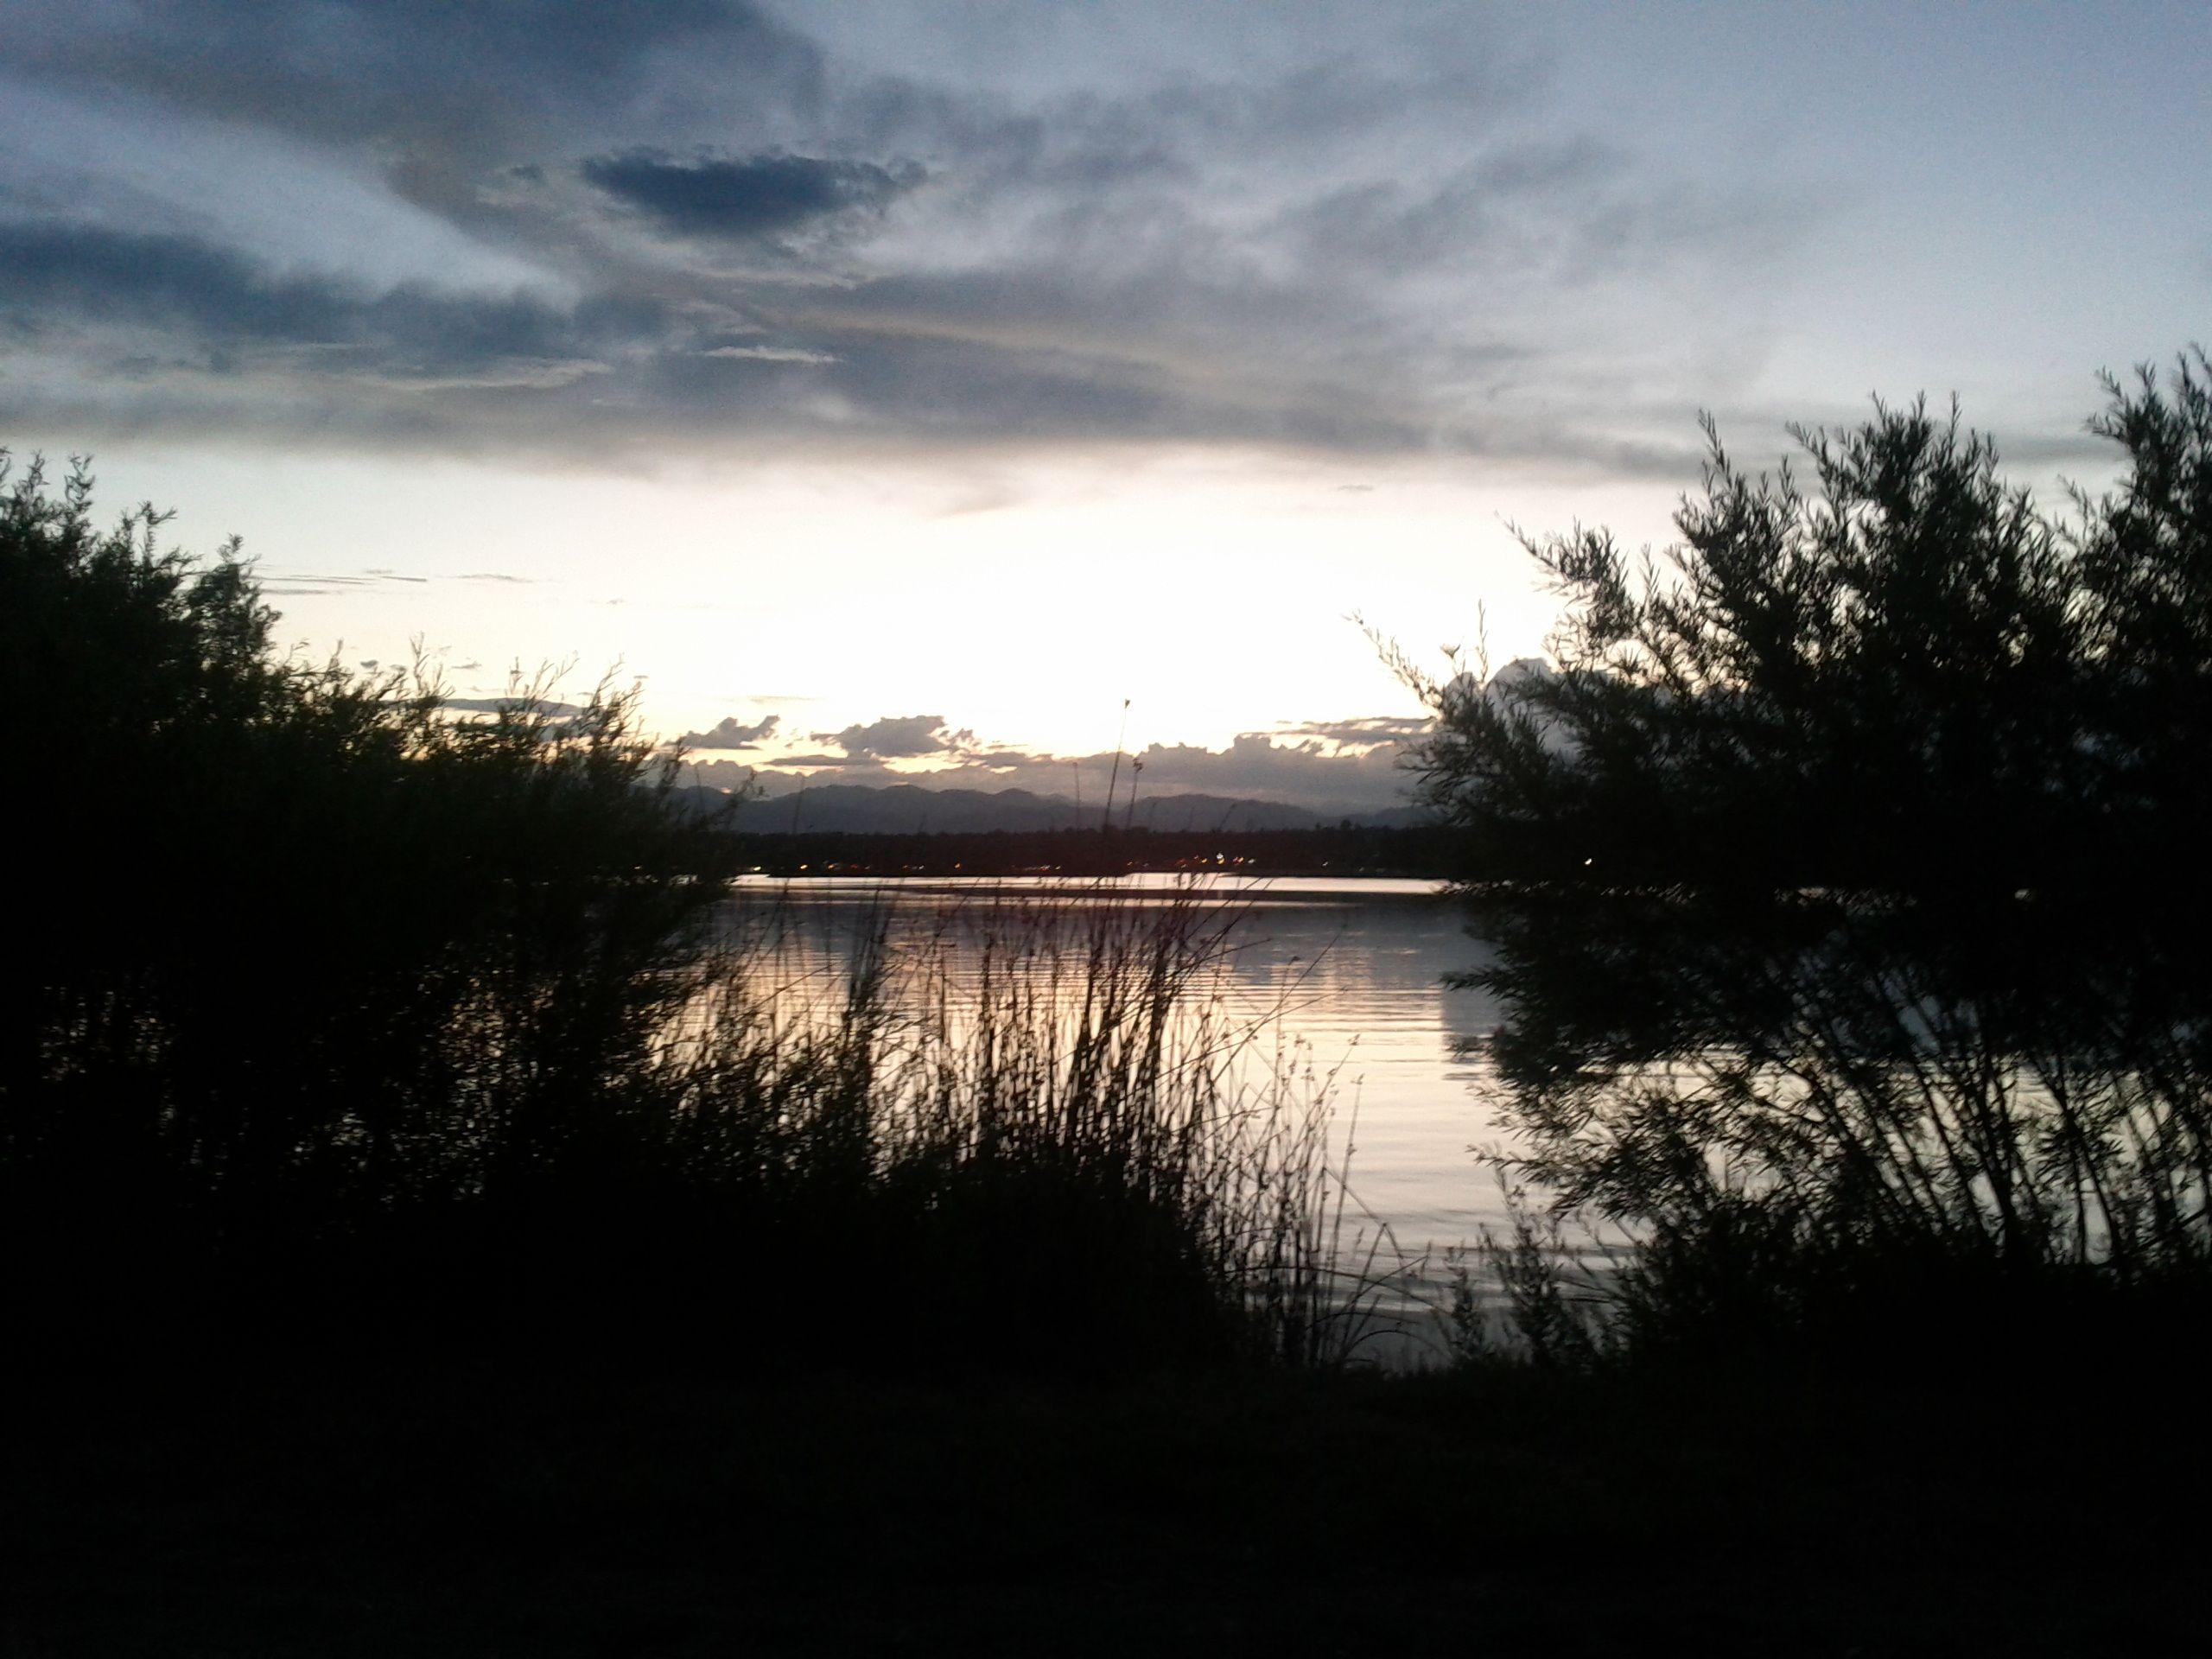 Sloans Lake Lakewood Colorado At Sunset Sunset Lake Beautiful Homes